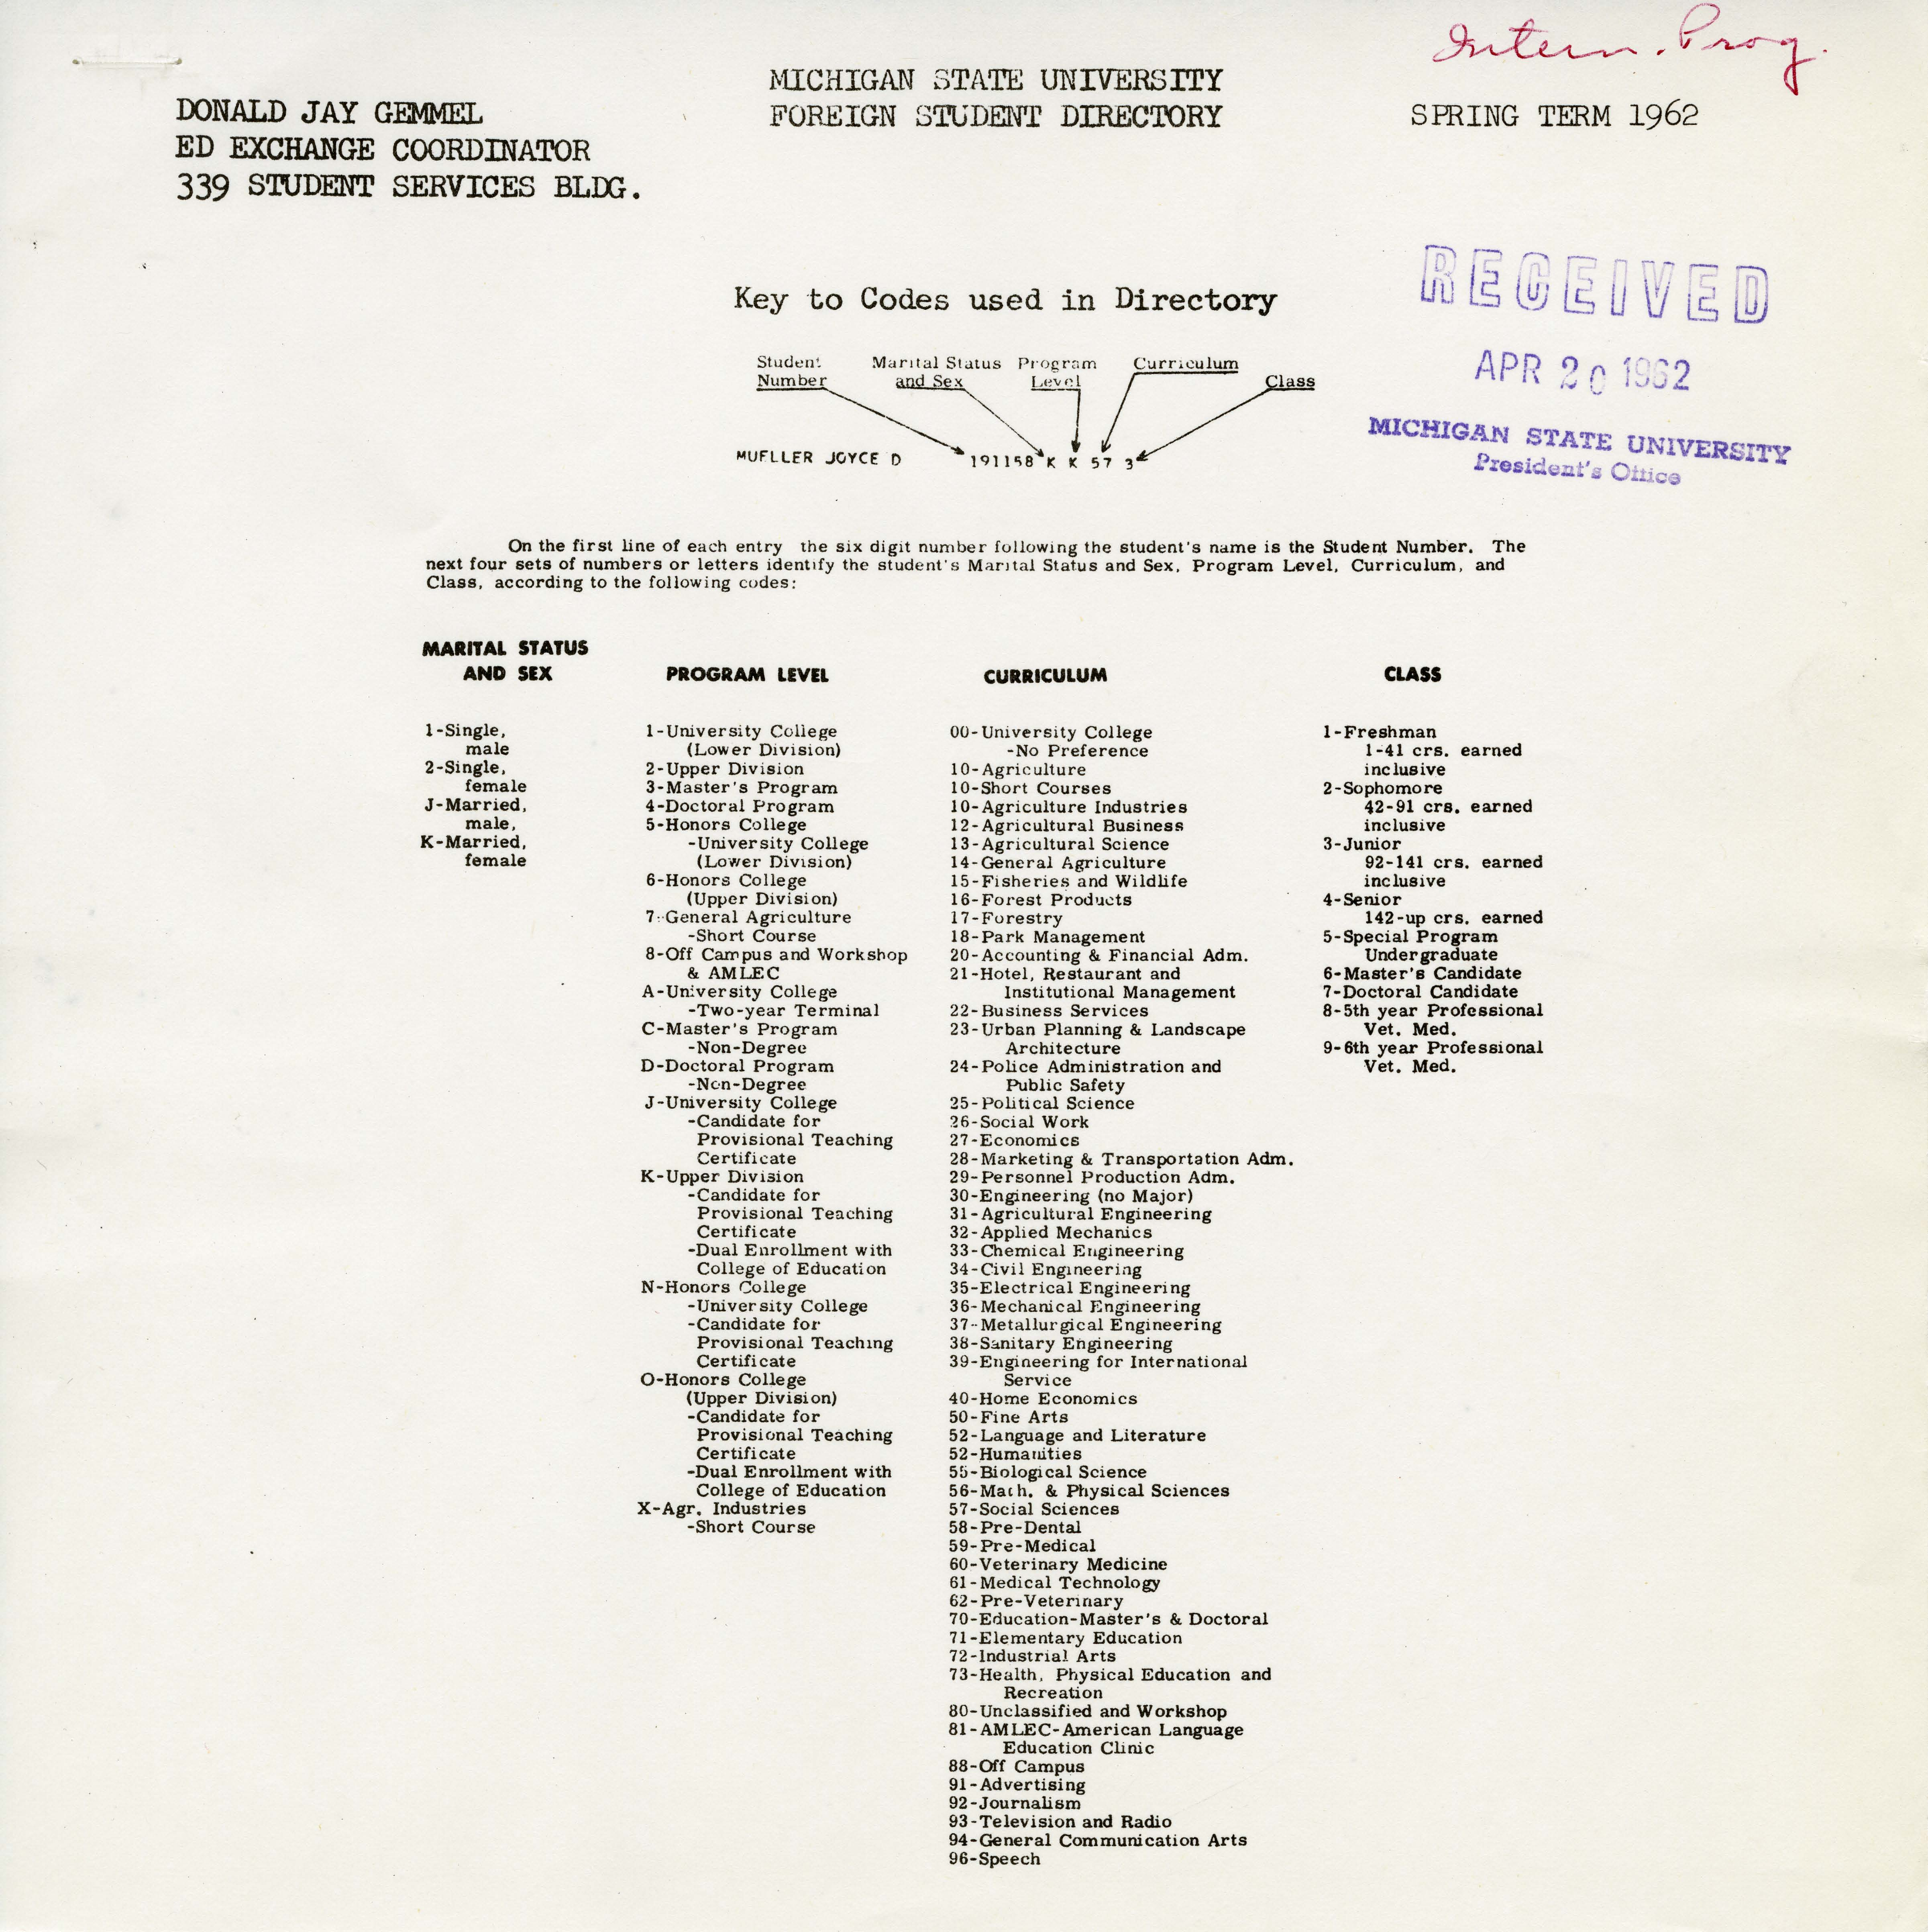 1963 (Summer) International Student Directory